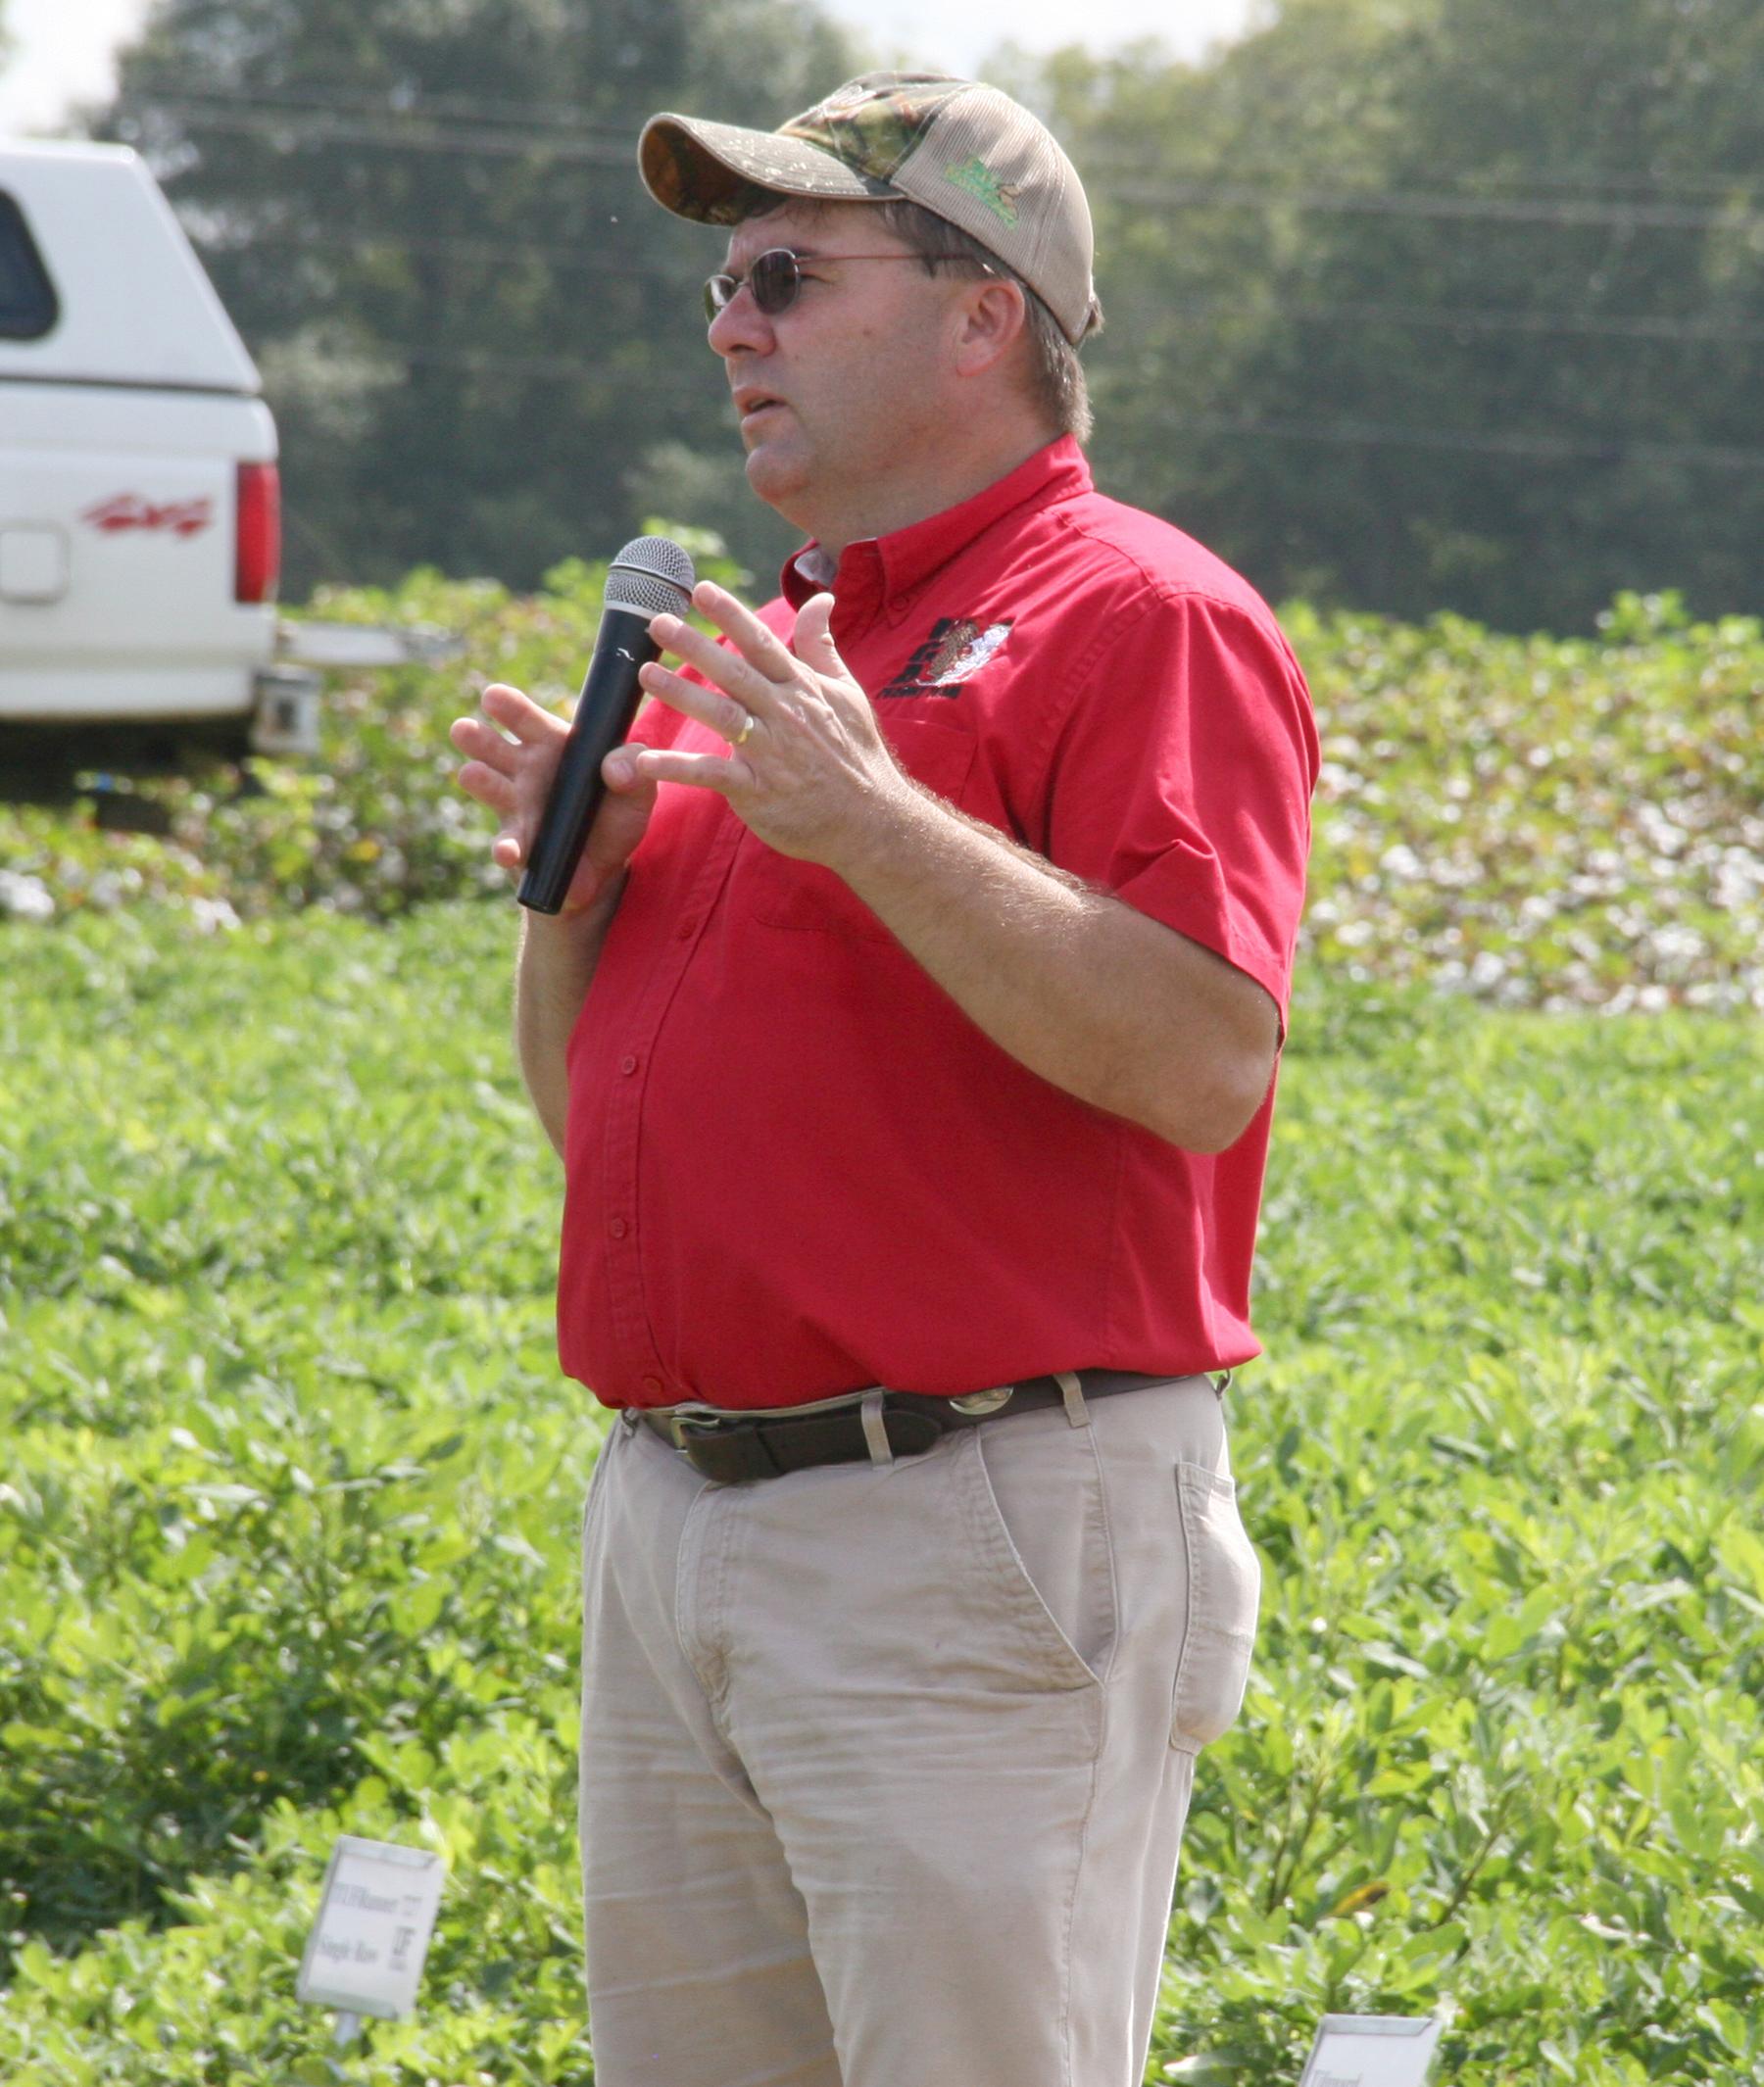 University of Georgia Extension peanut agronomist Scott Monfort speaks during UGA's annual Cotton and Peanut Field Day, held Wednesday, Sept. 9.